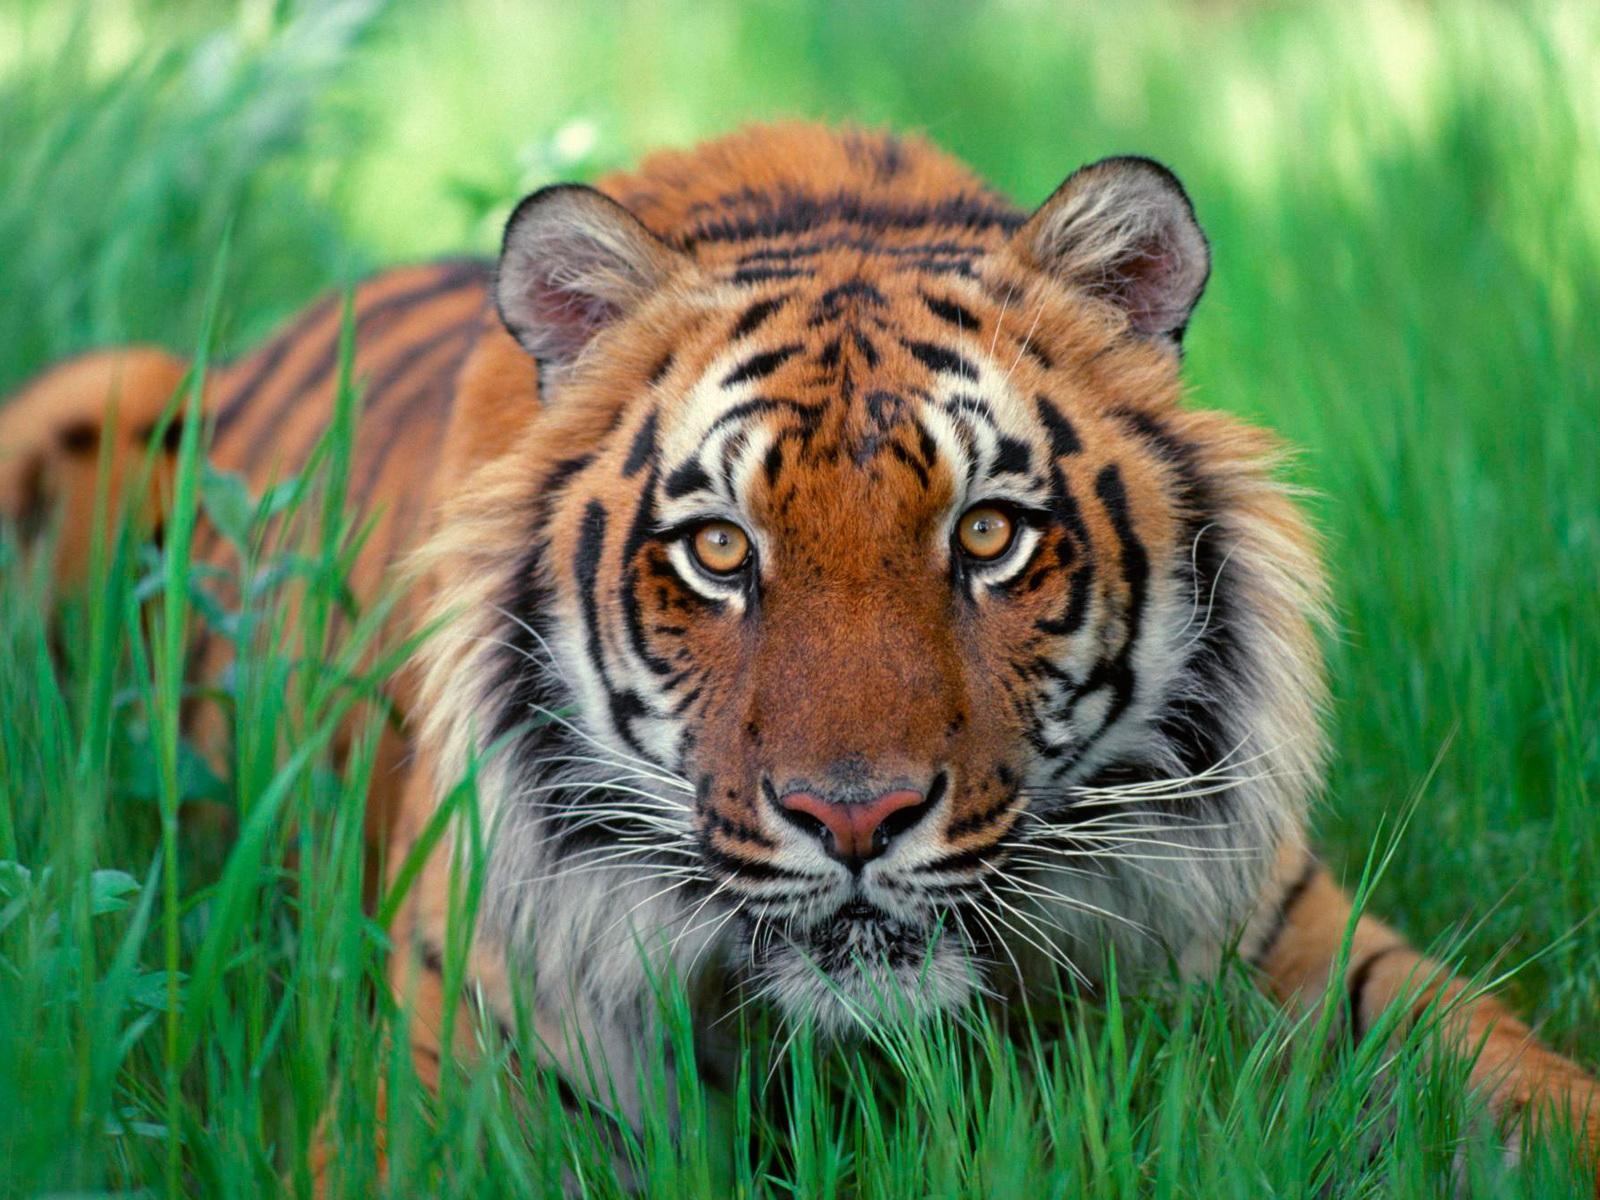 Tiger-Desktop-HD-Wallpapers-Download-www.stillmaza.com-3